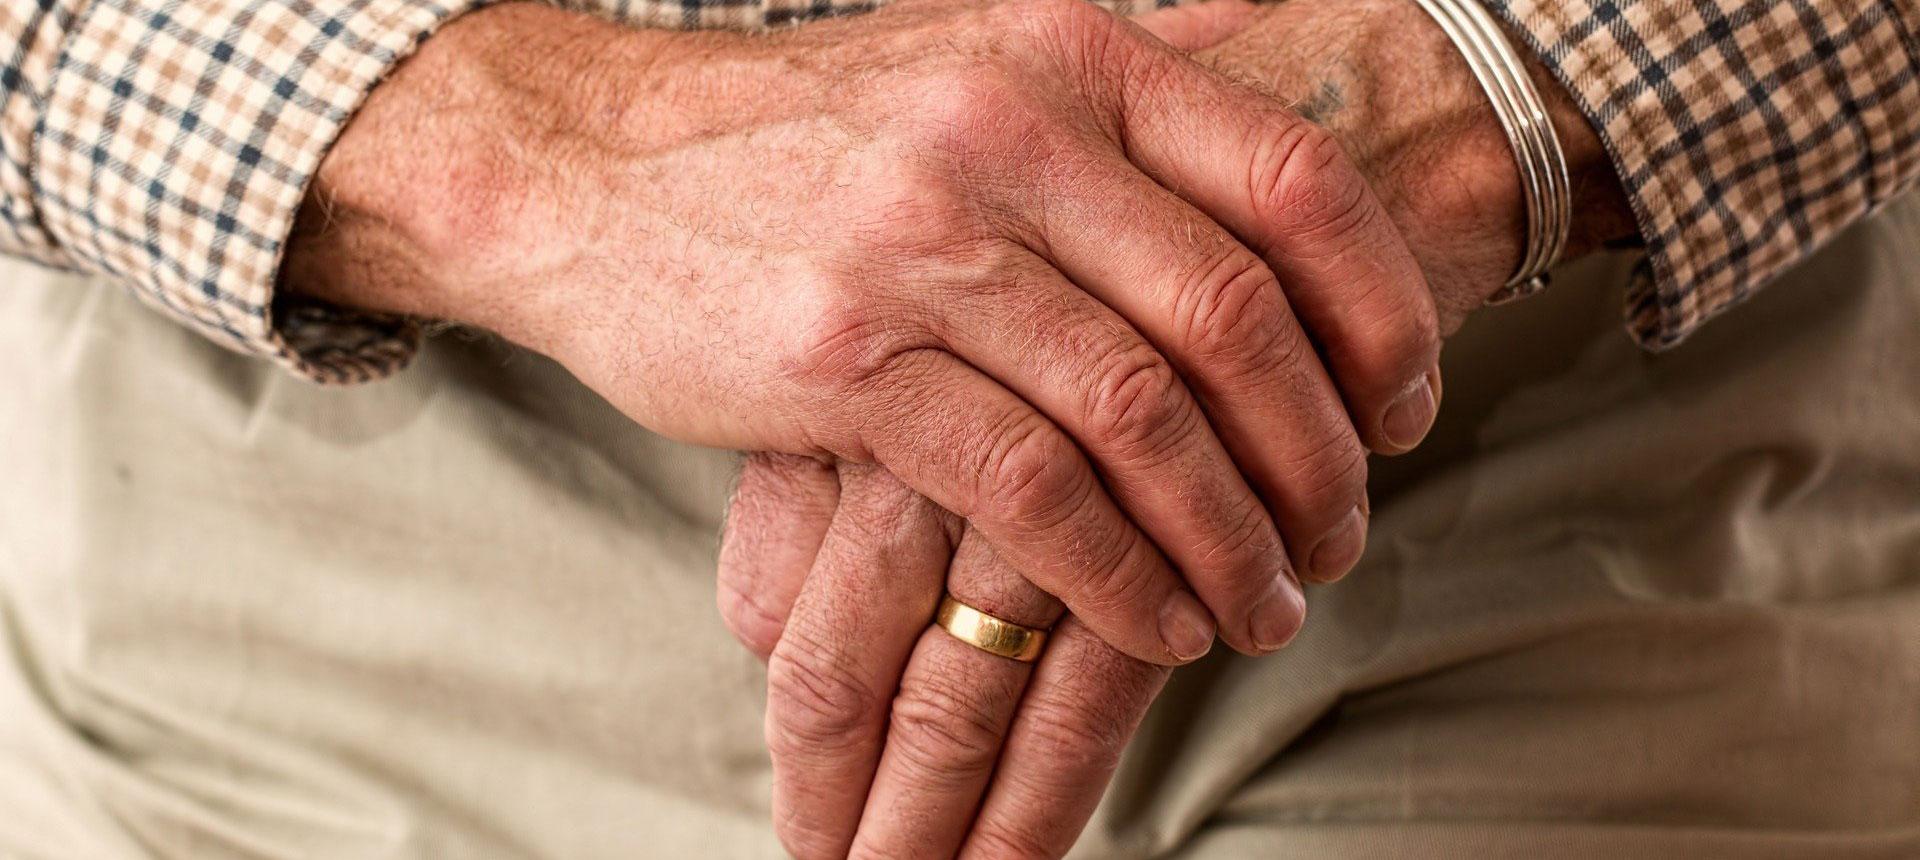 Elderly hands holding a cane.